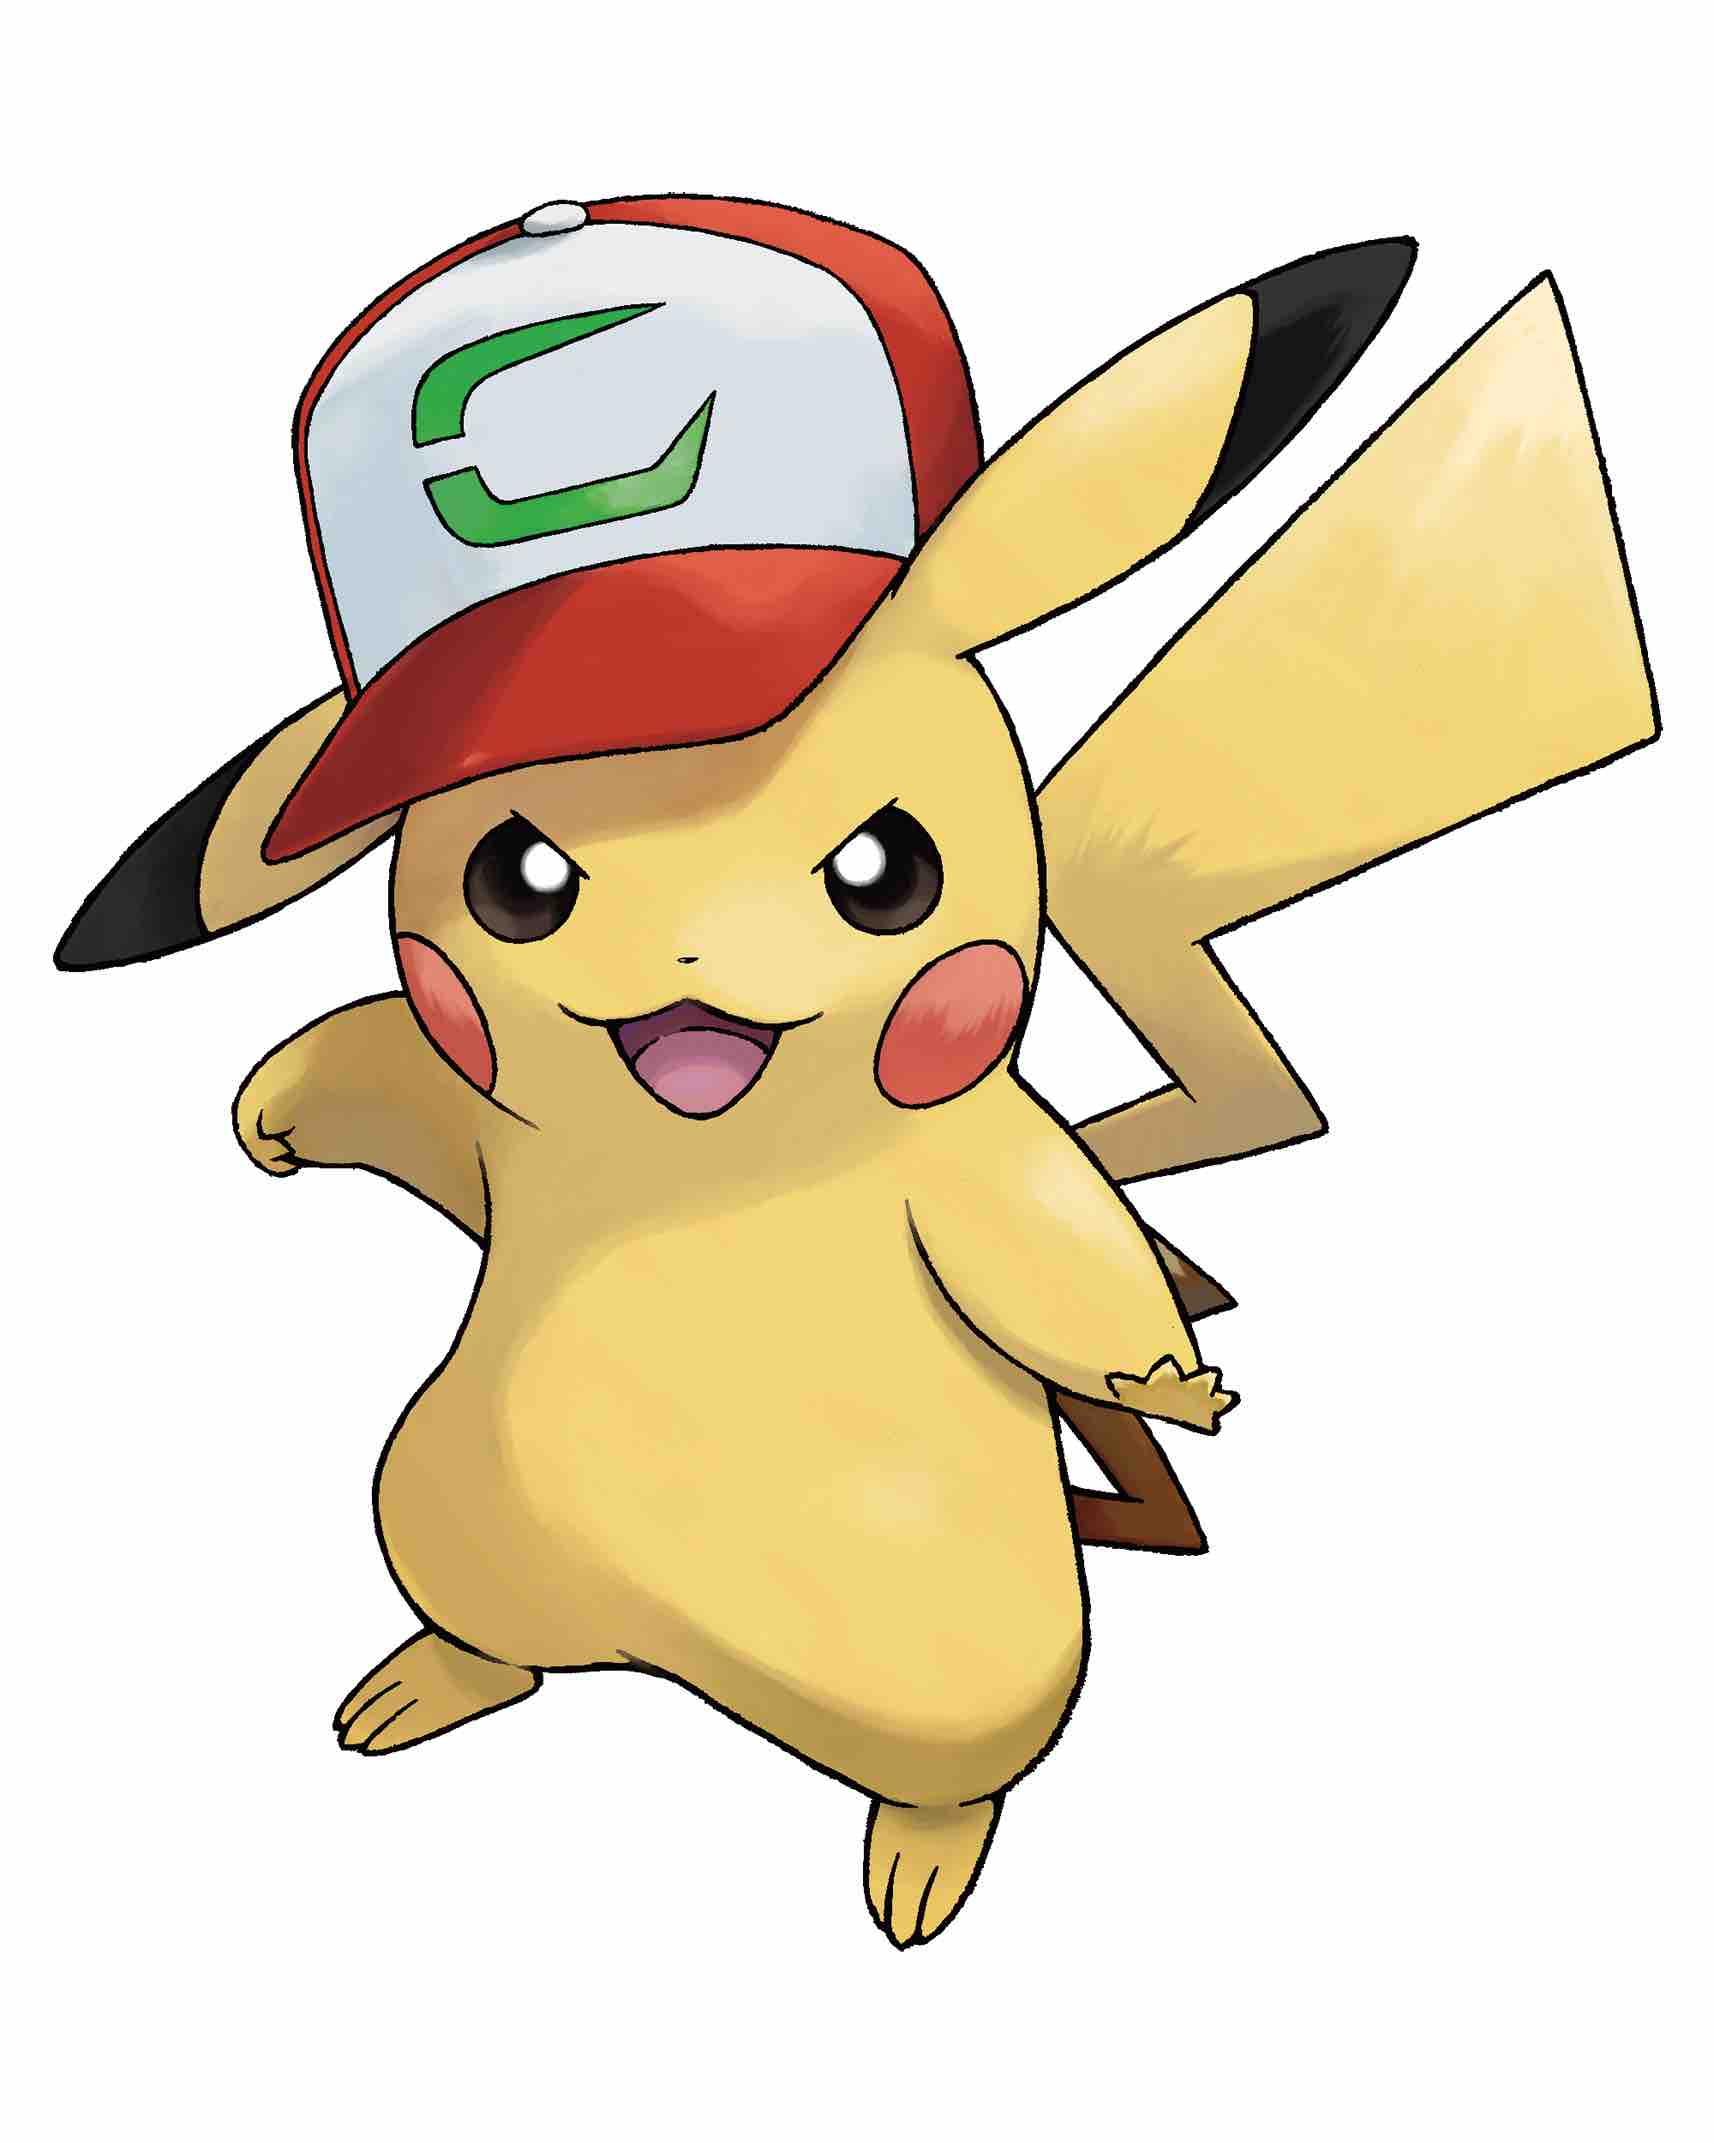 Grab An Ash Hat Pikachu Qr Code And Pok 233 Mon Tcg Card When You See Pok 233 Mon The Movie I Choose